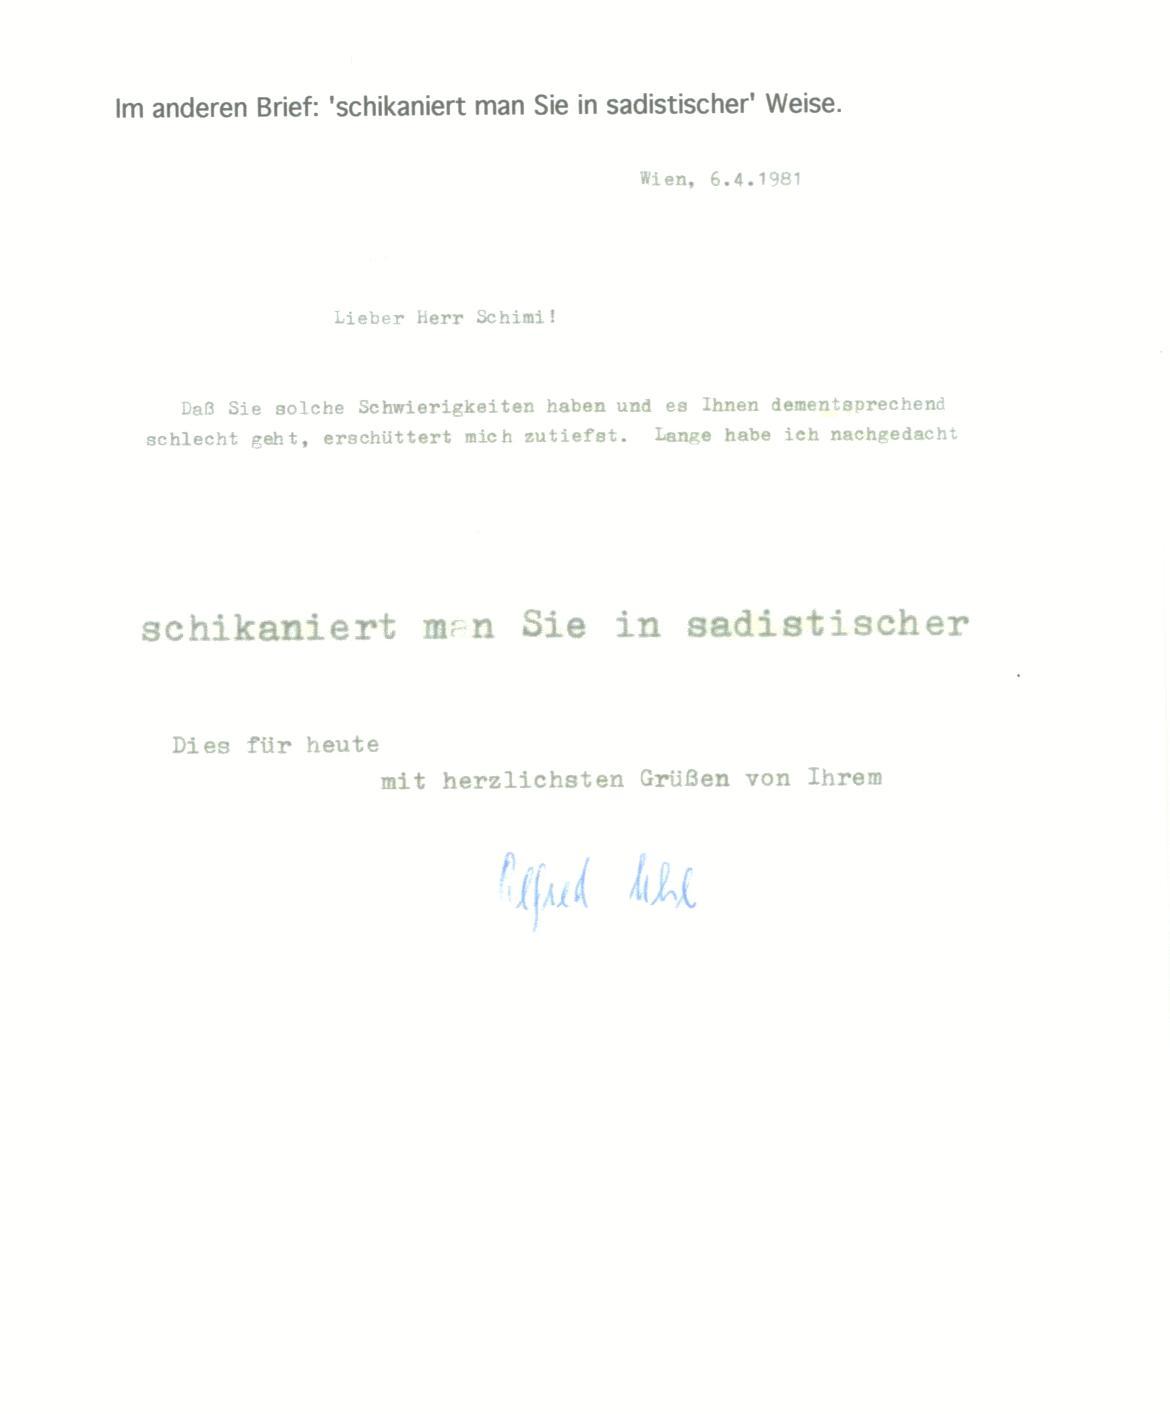 Prof Uhl schikaniert1